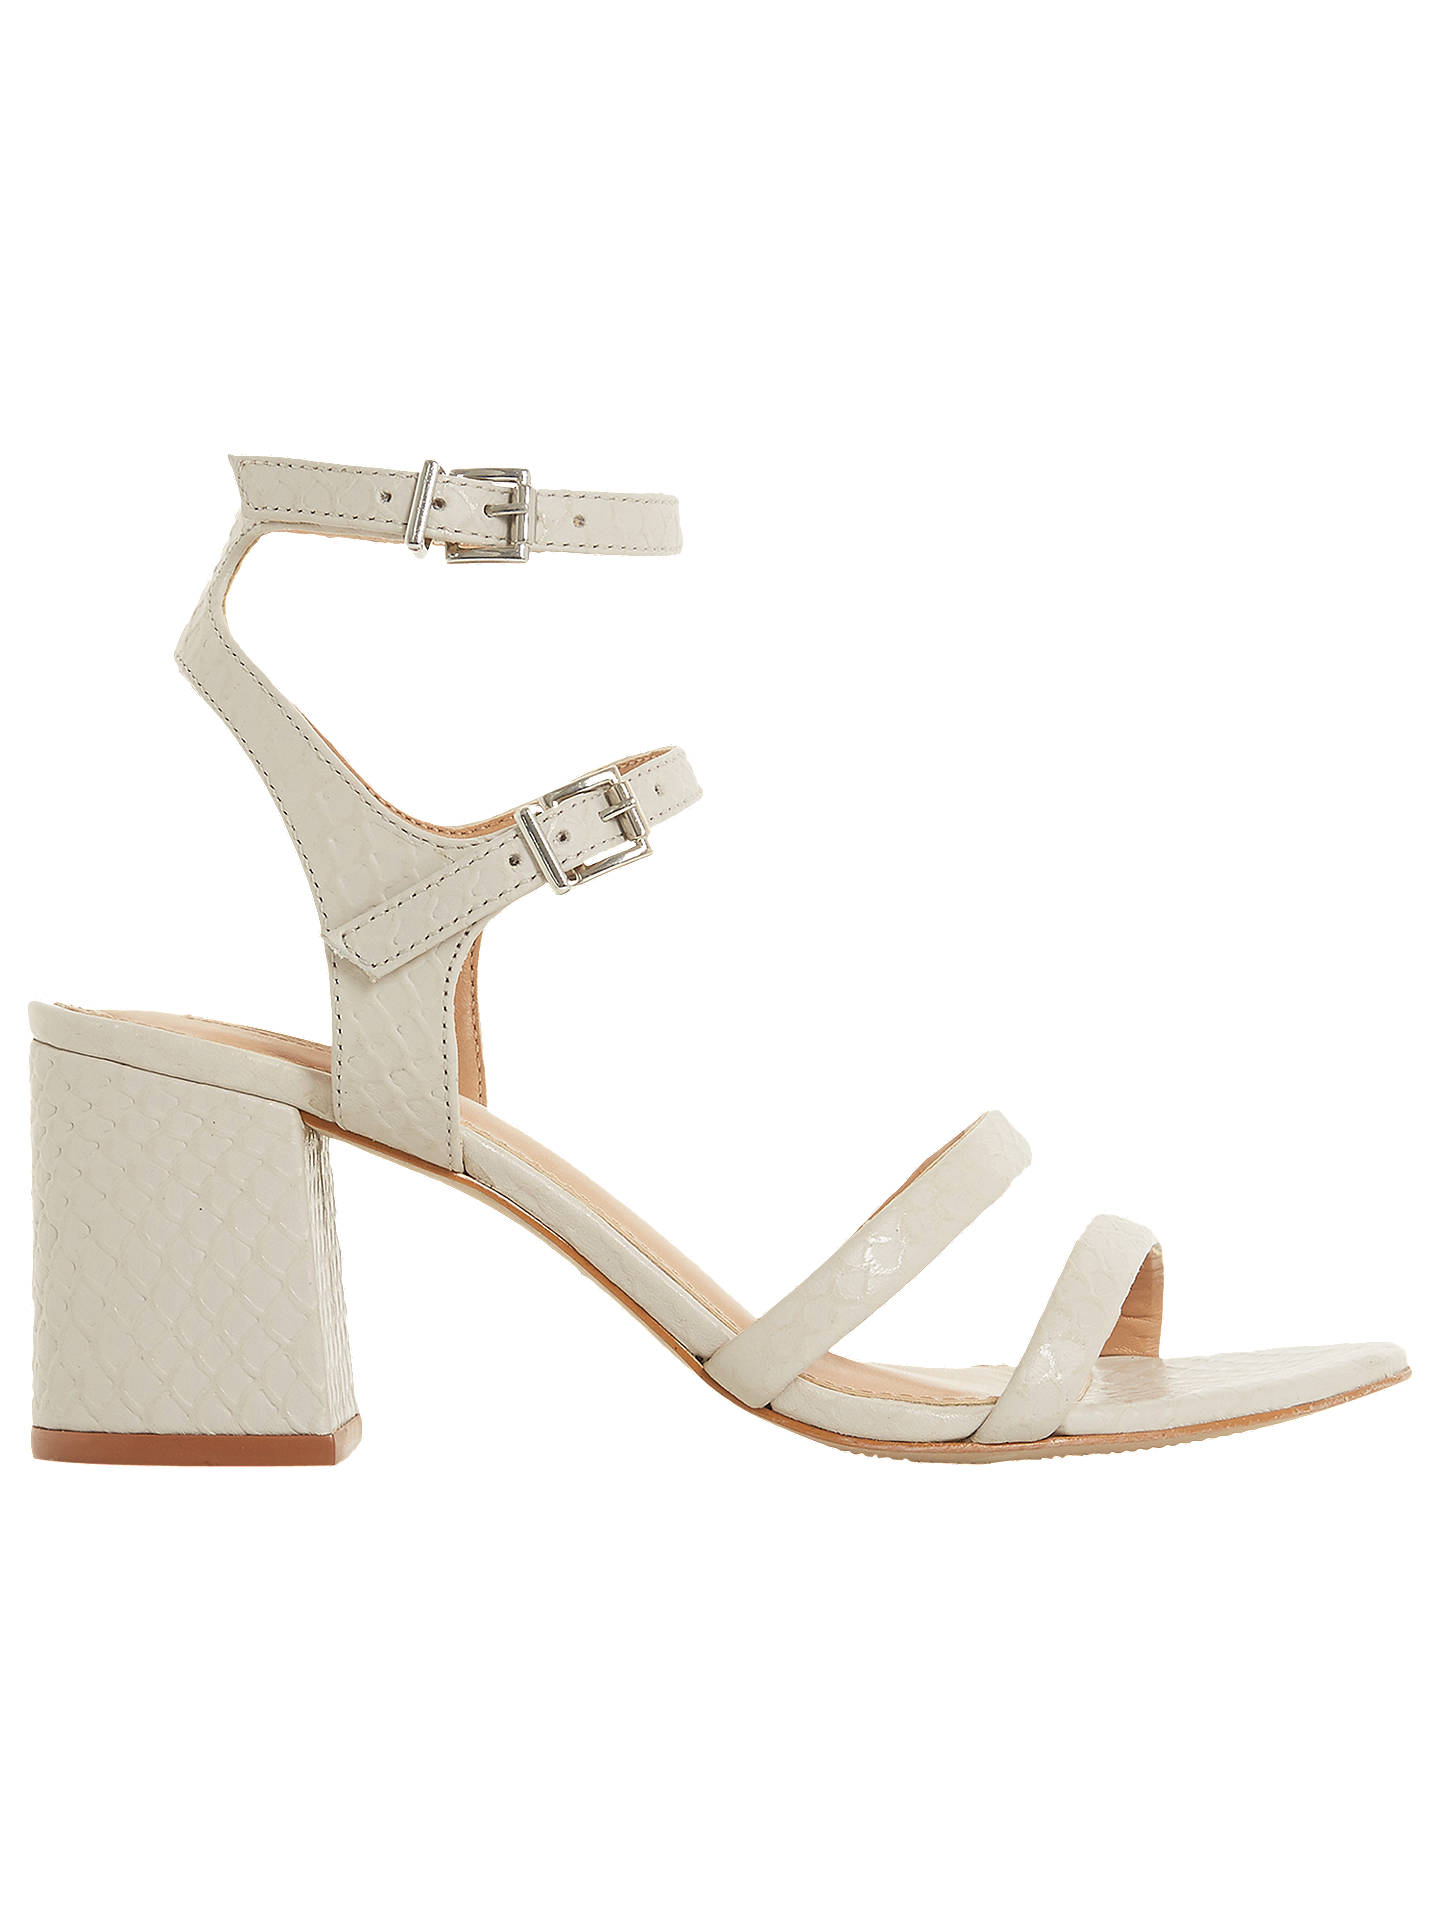 42901143bd Buy Dune Magner Block Heel Sandals, Reptile Grey Leather, 3 Online at  johnlewis.